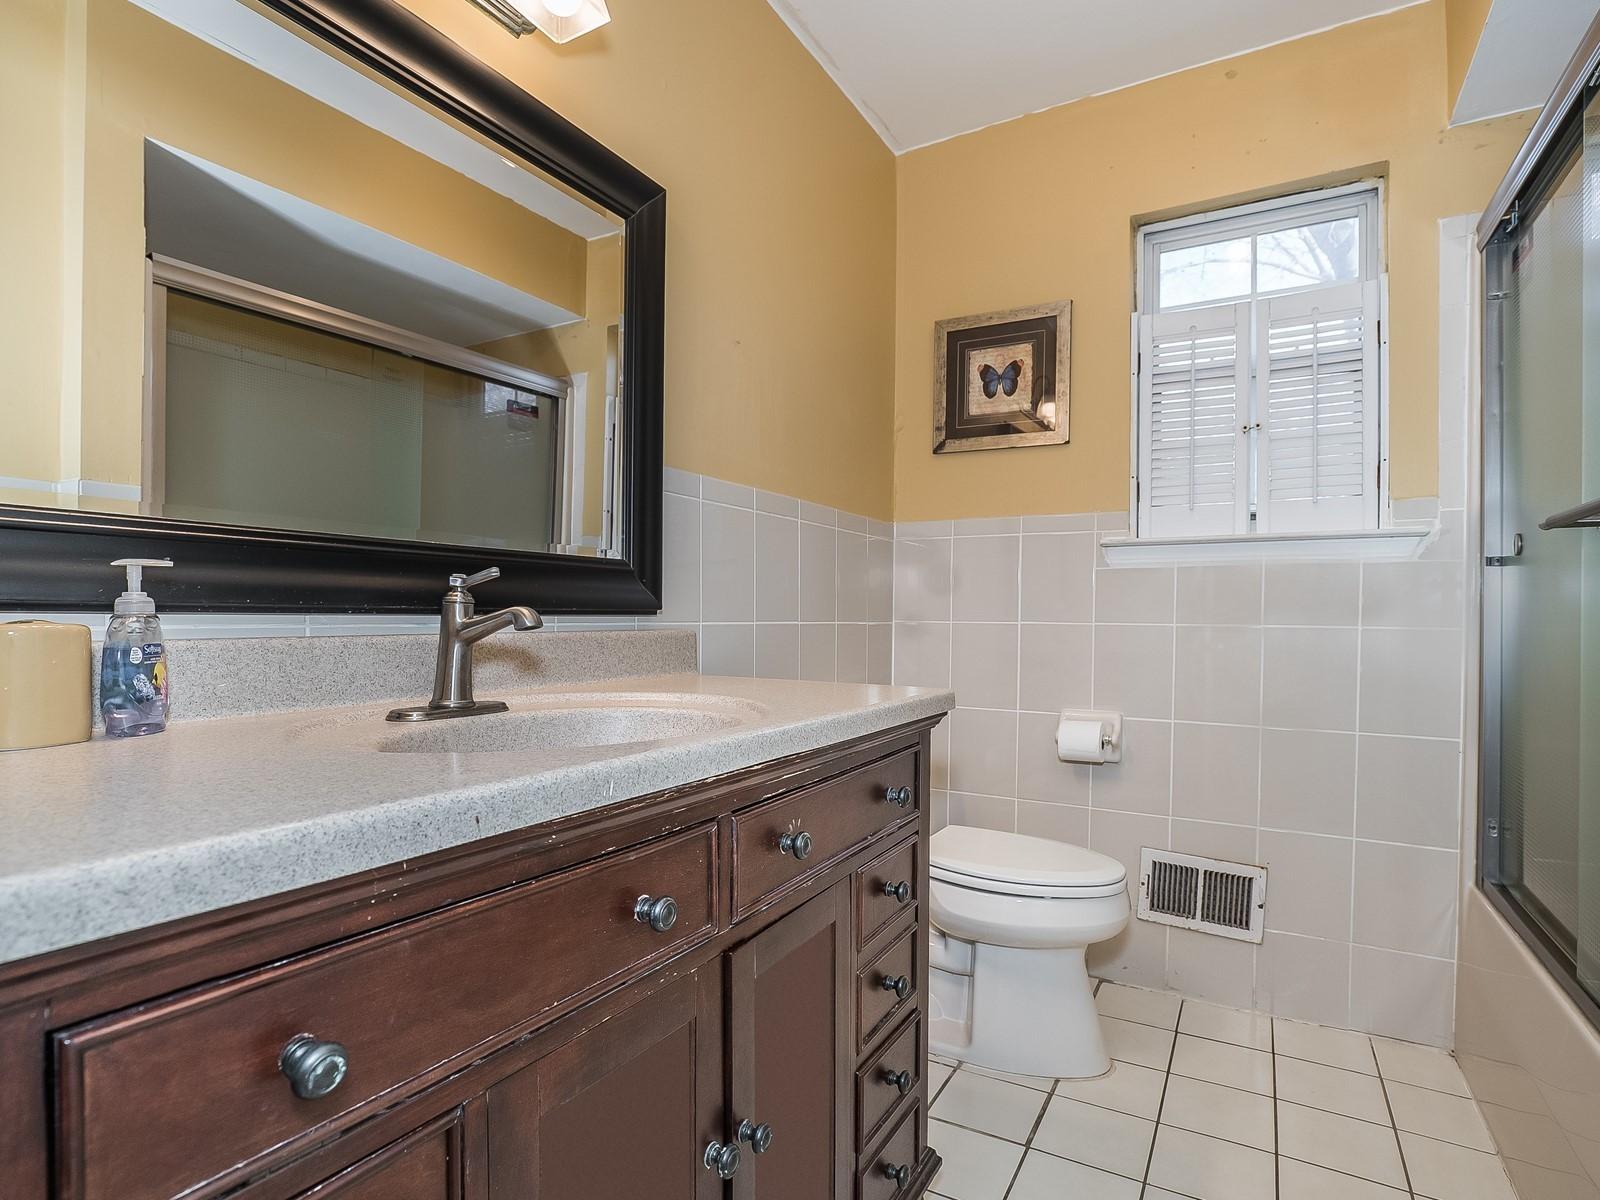 15_Furnished-House-Woodbridge_upstairs-bath